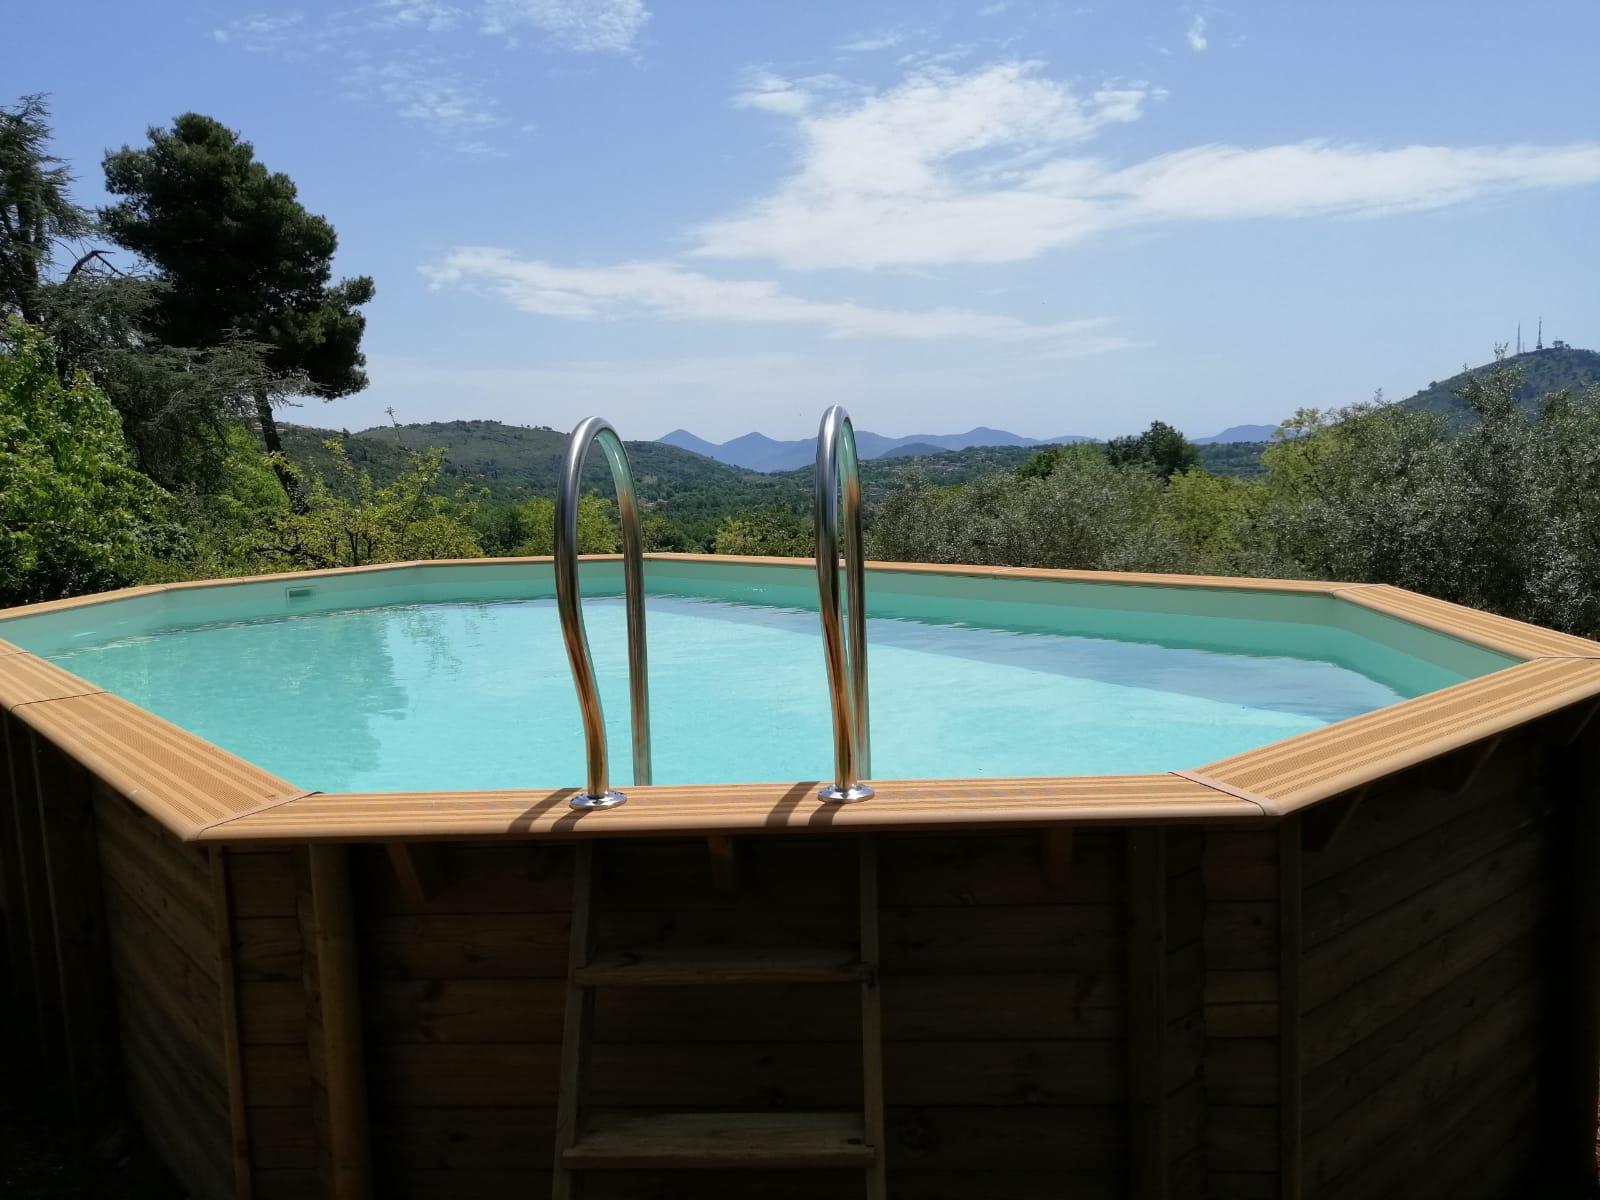 piscina in legno fuori terra